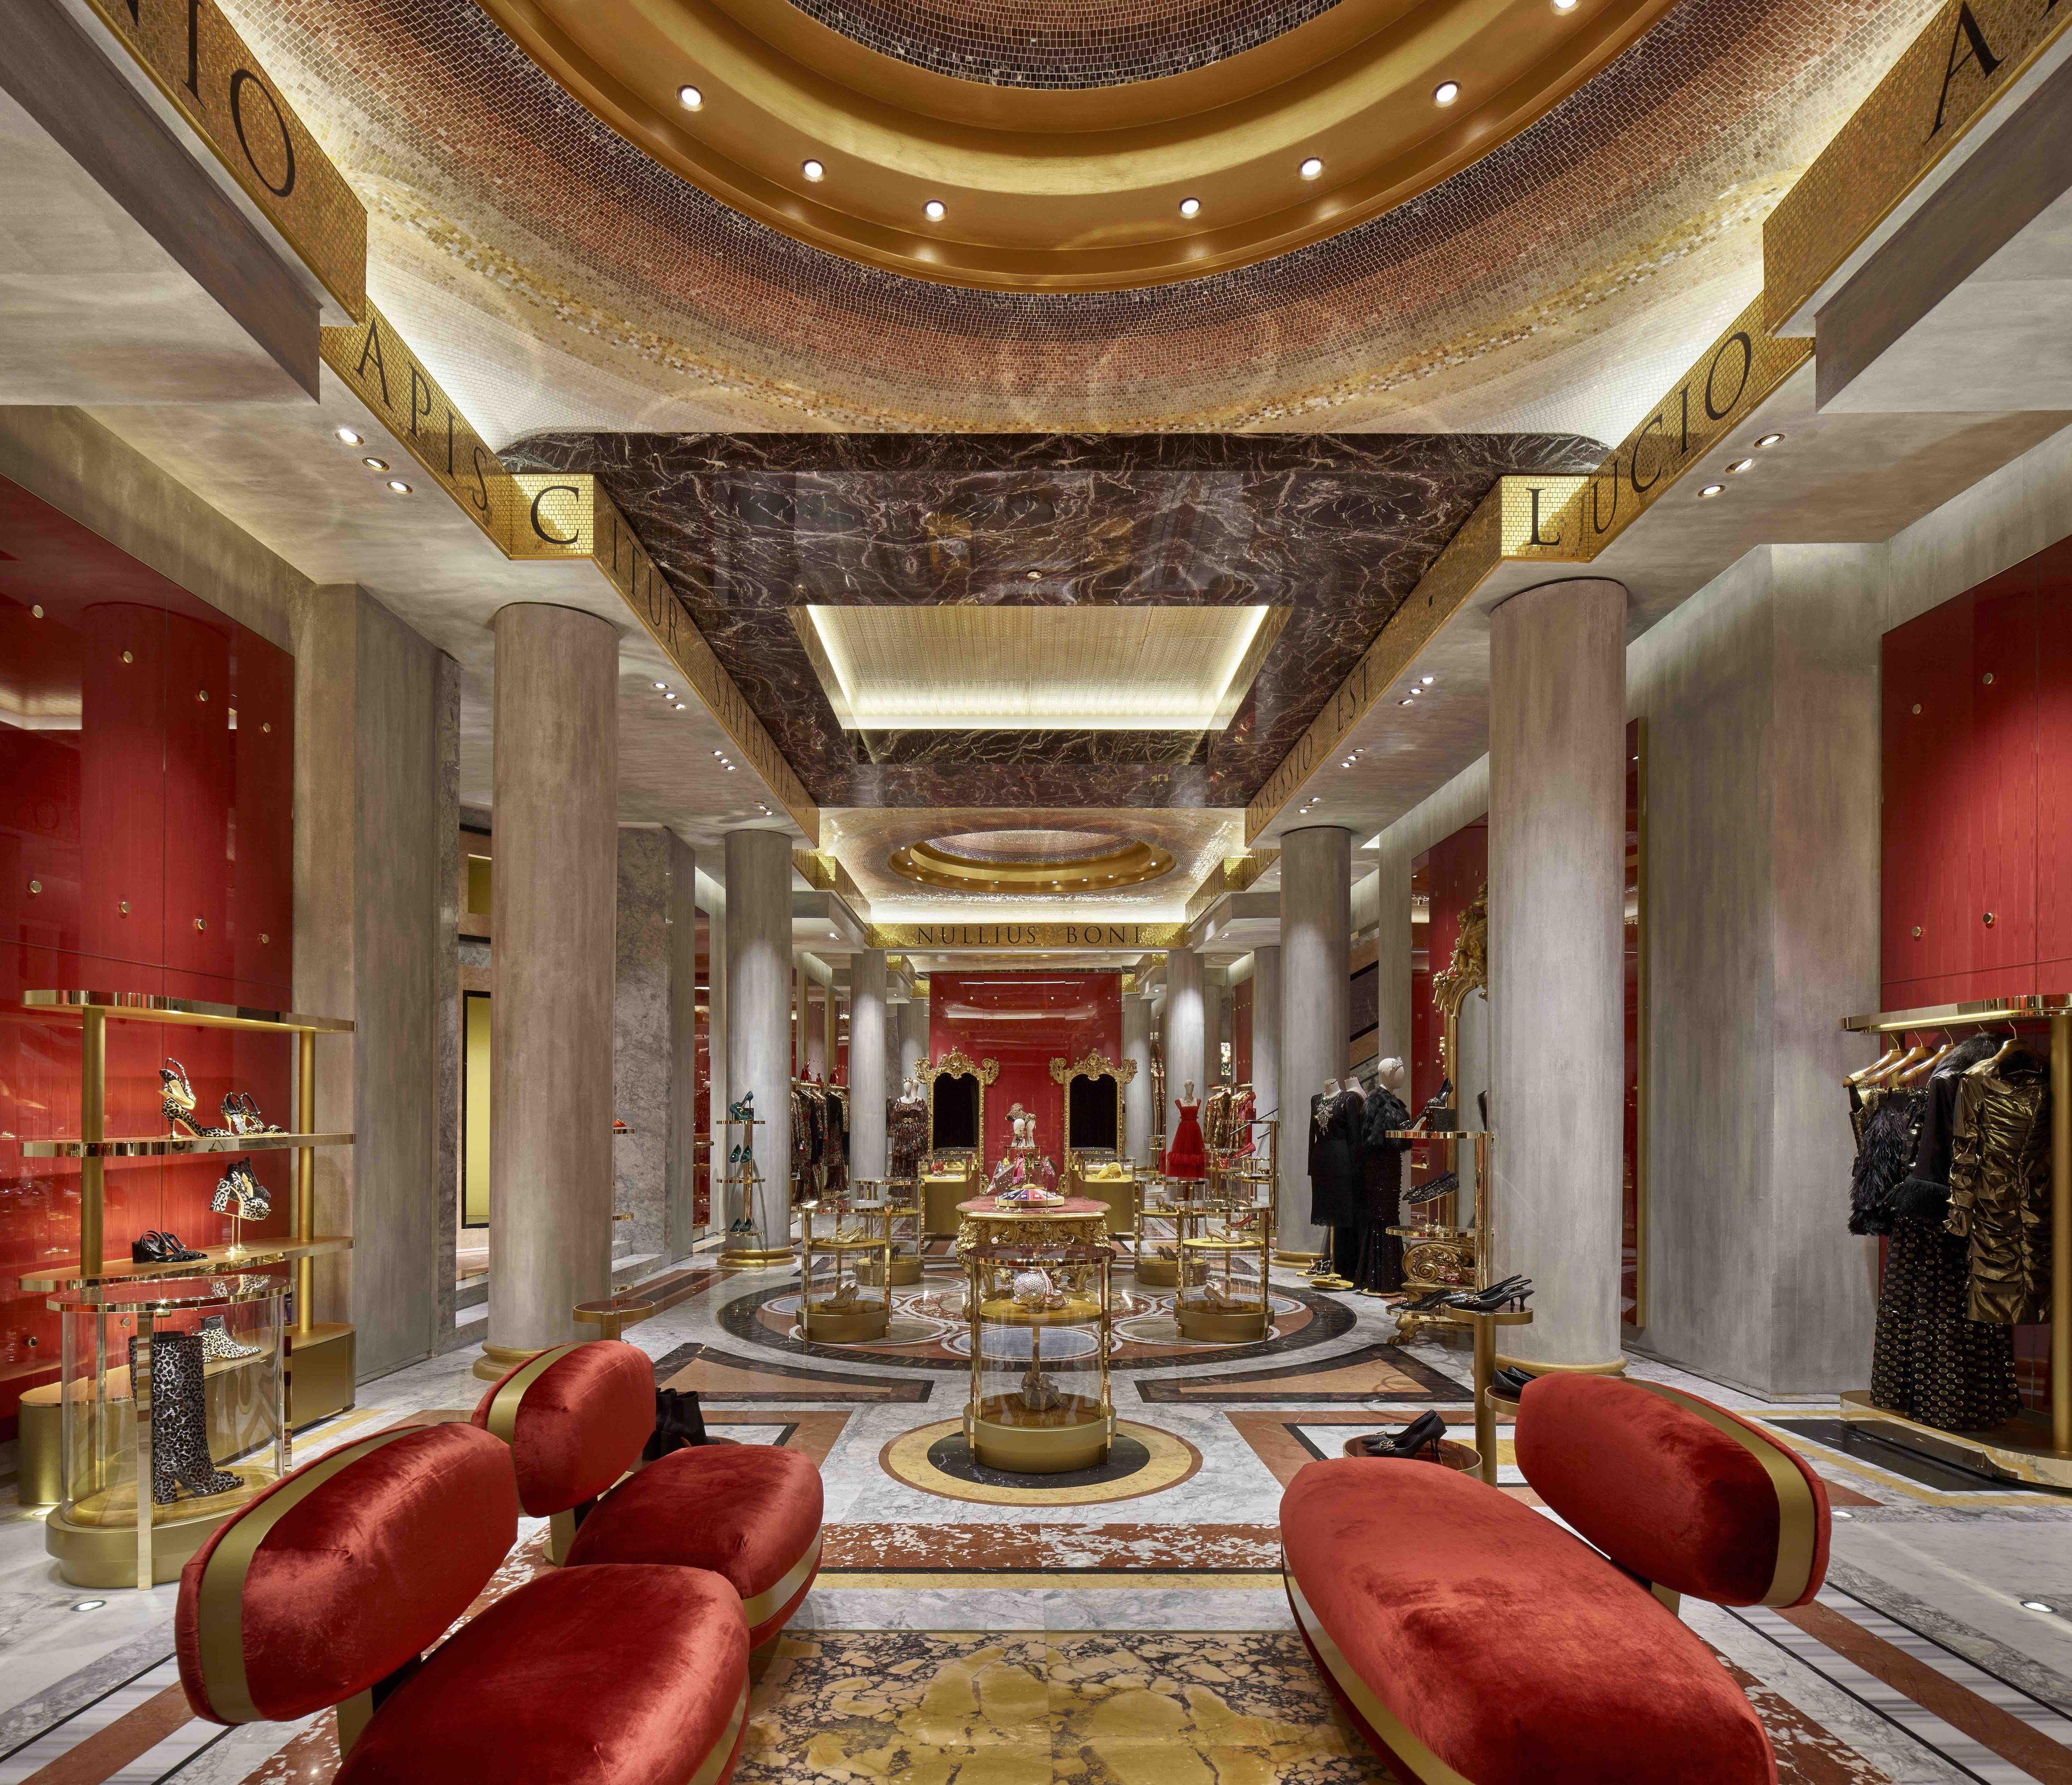 Dolce & Gabbana newly renovated store in Rome, Piazza di Spagna